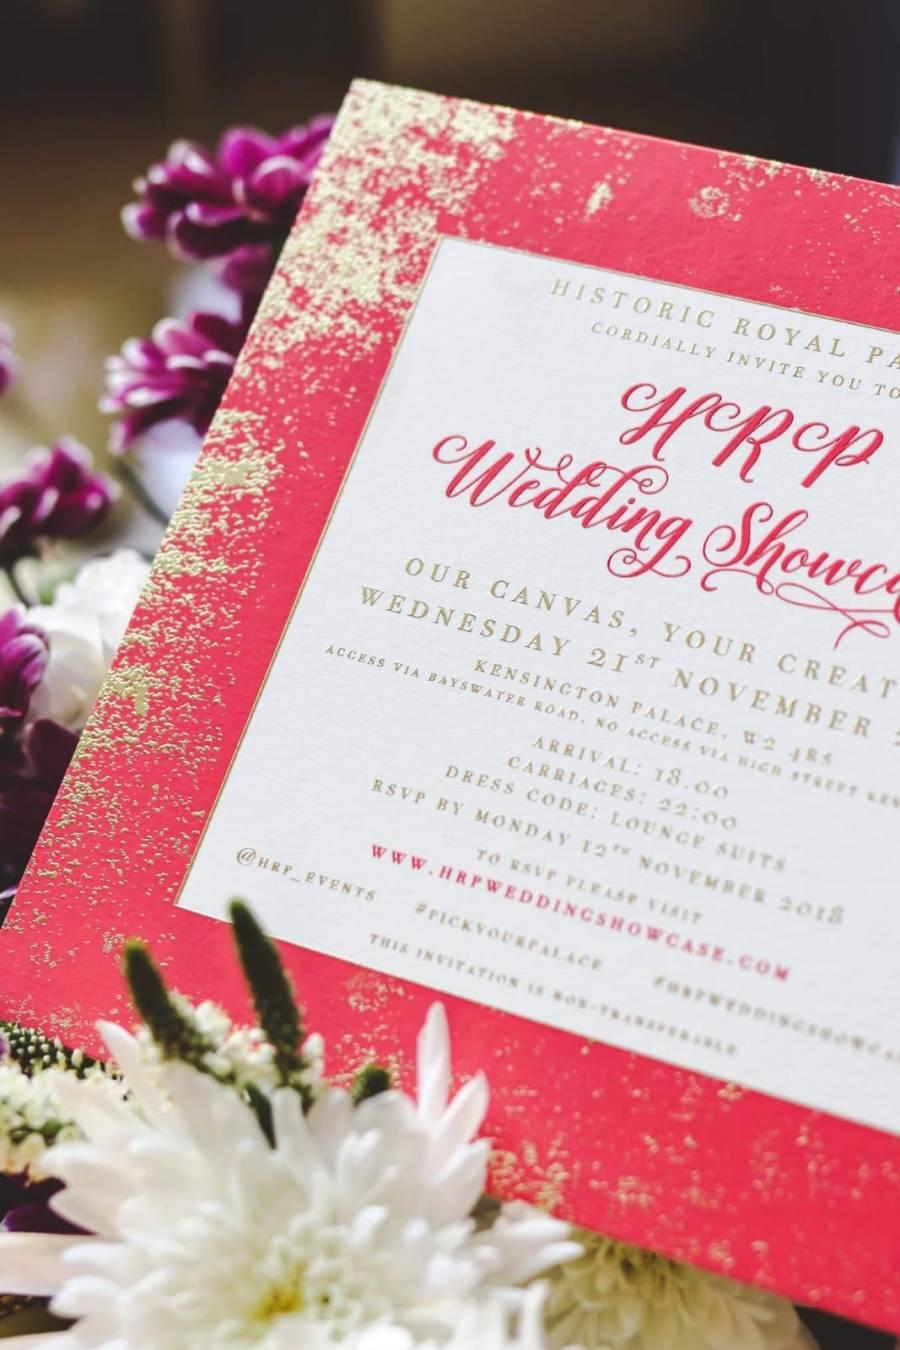 A wedding showcase at Kensington Palace